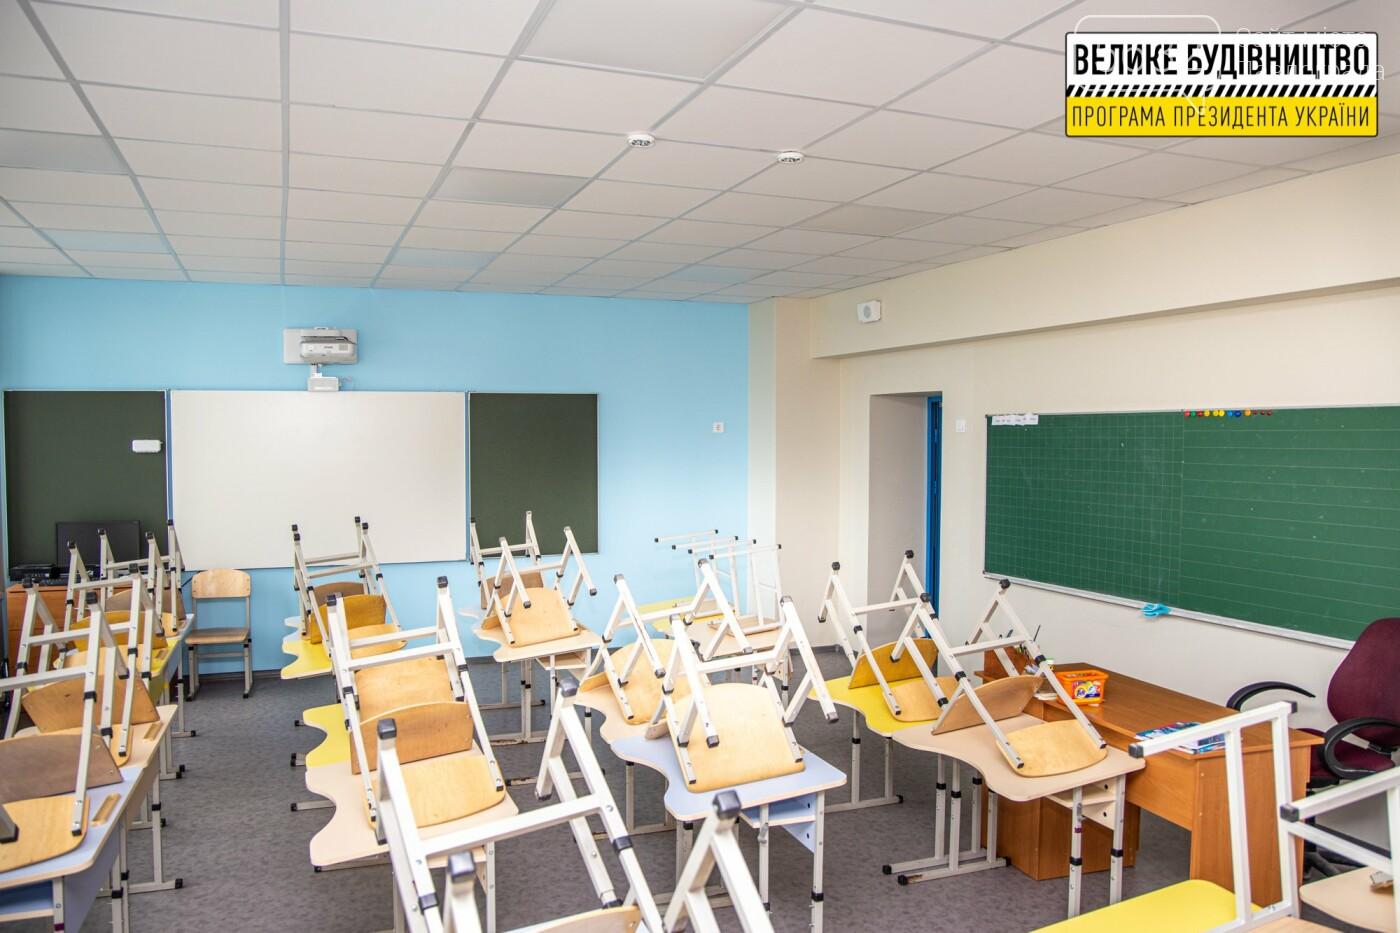 В Петропавловке модернизируют опорную школу (ФОТОРЕПОРТАЖ), фото-5